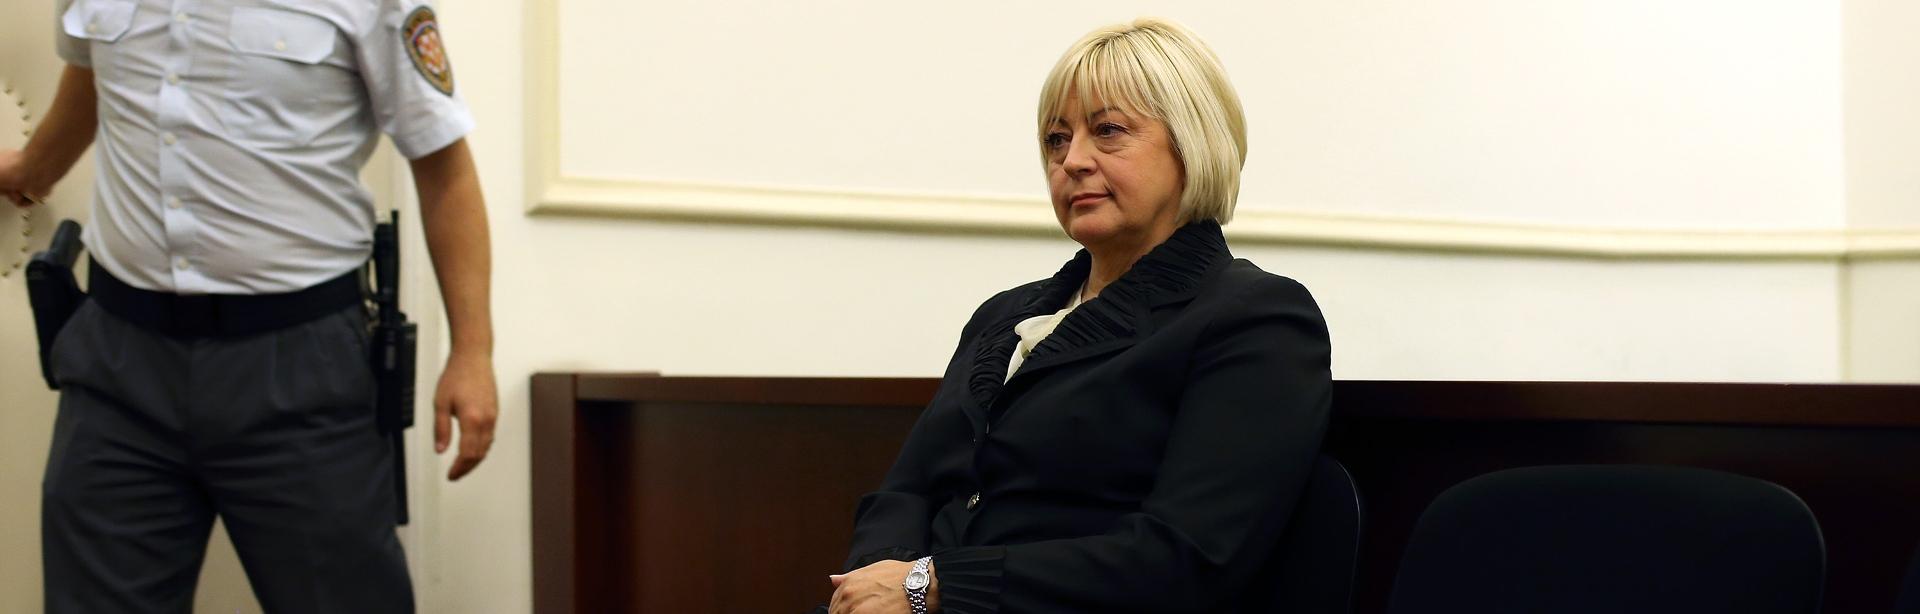 SLUČAJ FIMI-MEDIA Bivša šefica Hrvatske lutrije i Ante Todorić pod istragom